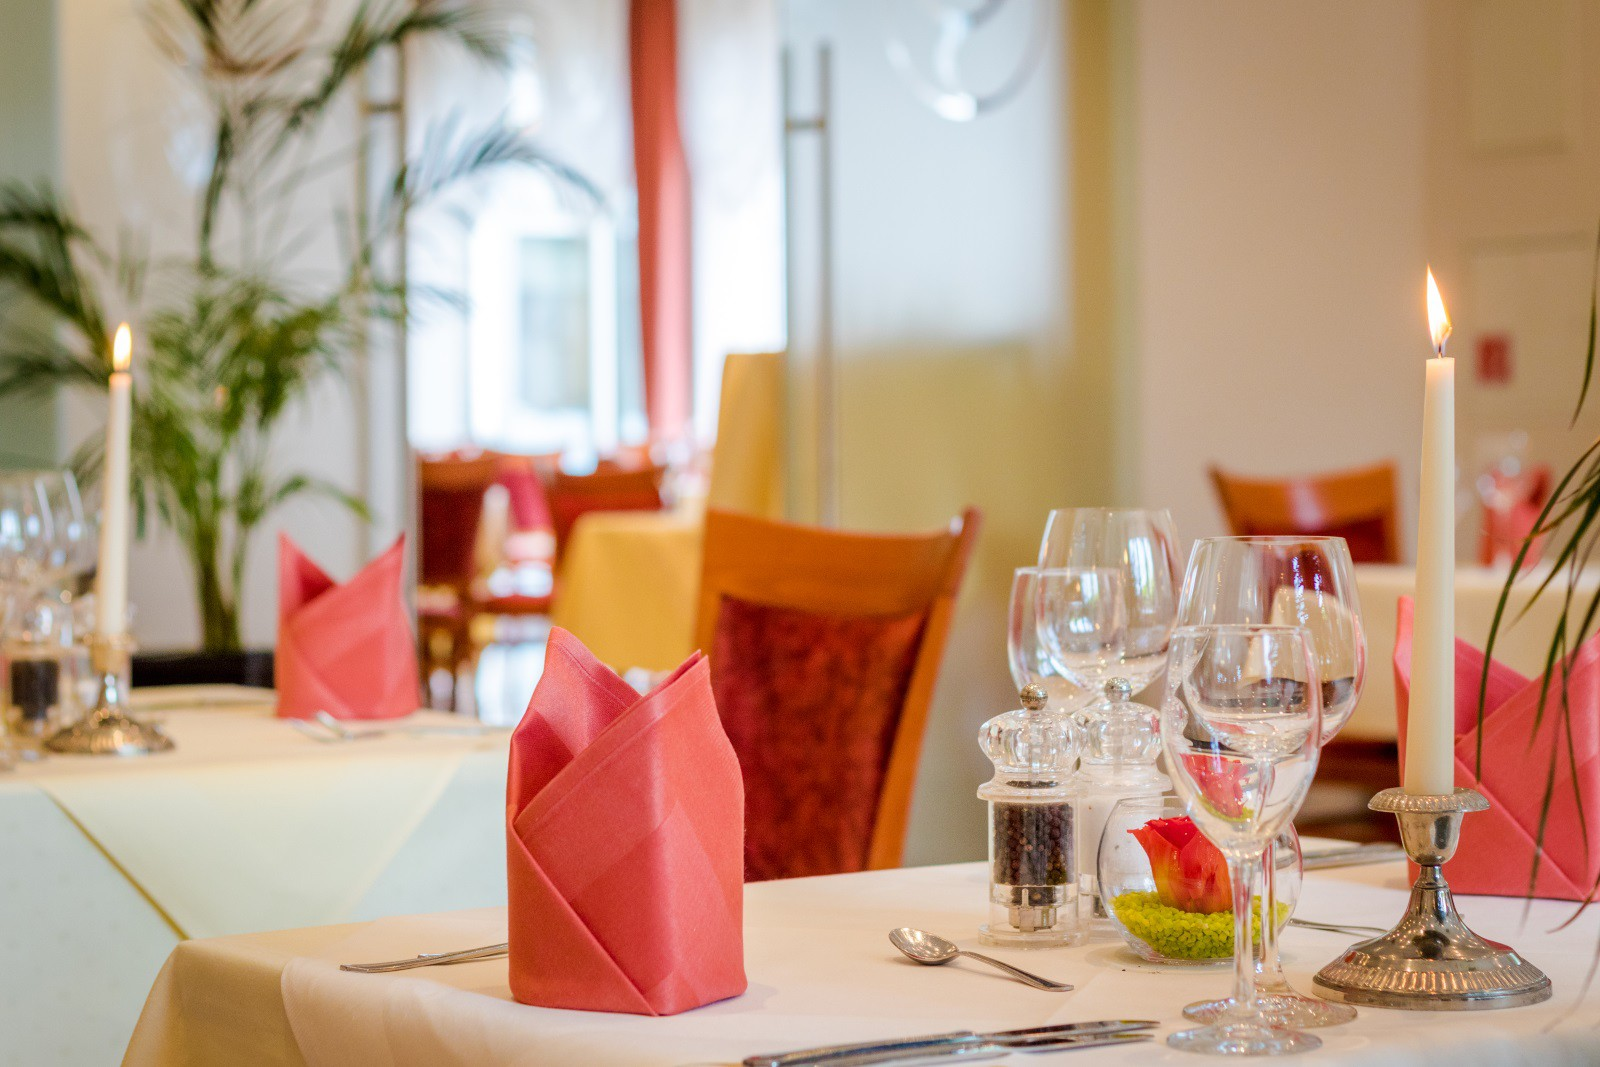 Restaurant Gartenhotel Heusser in Bad Dürkheim